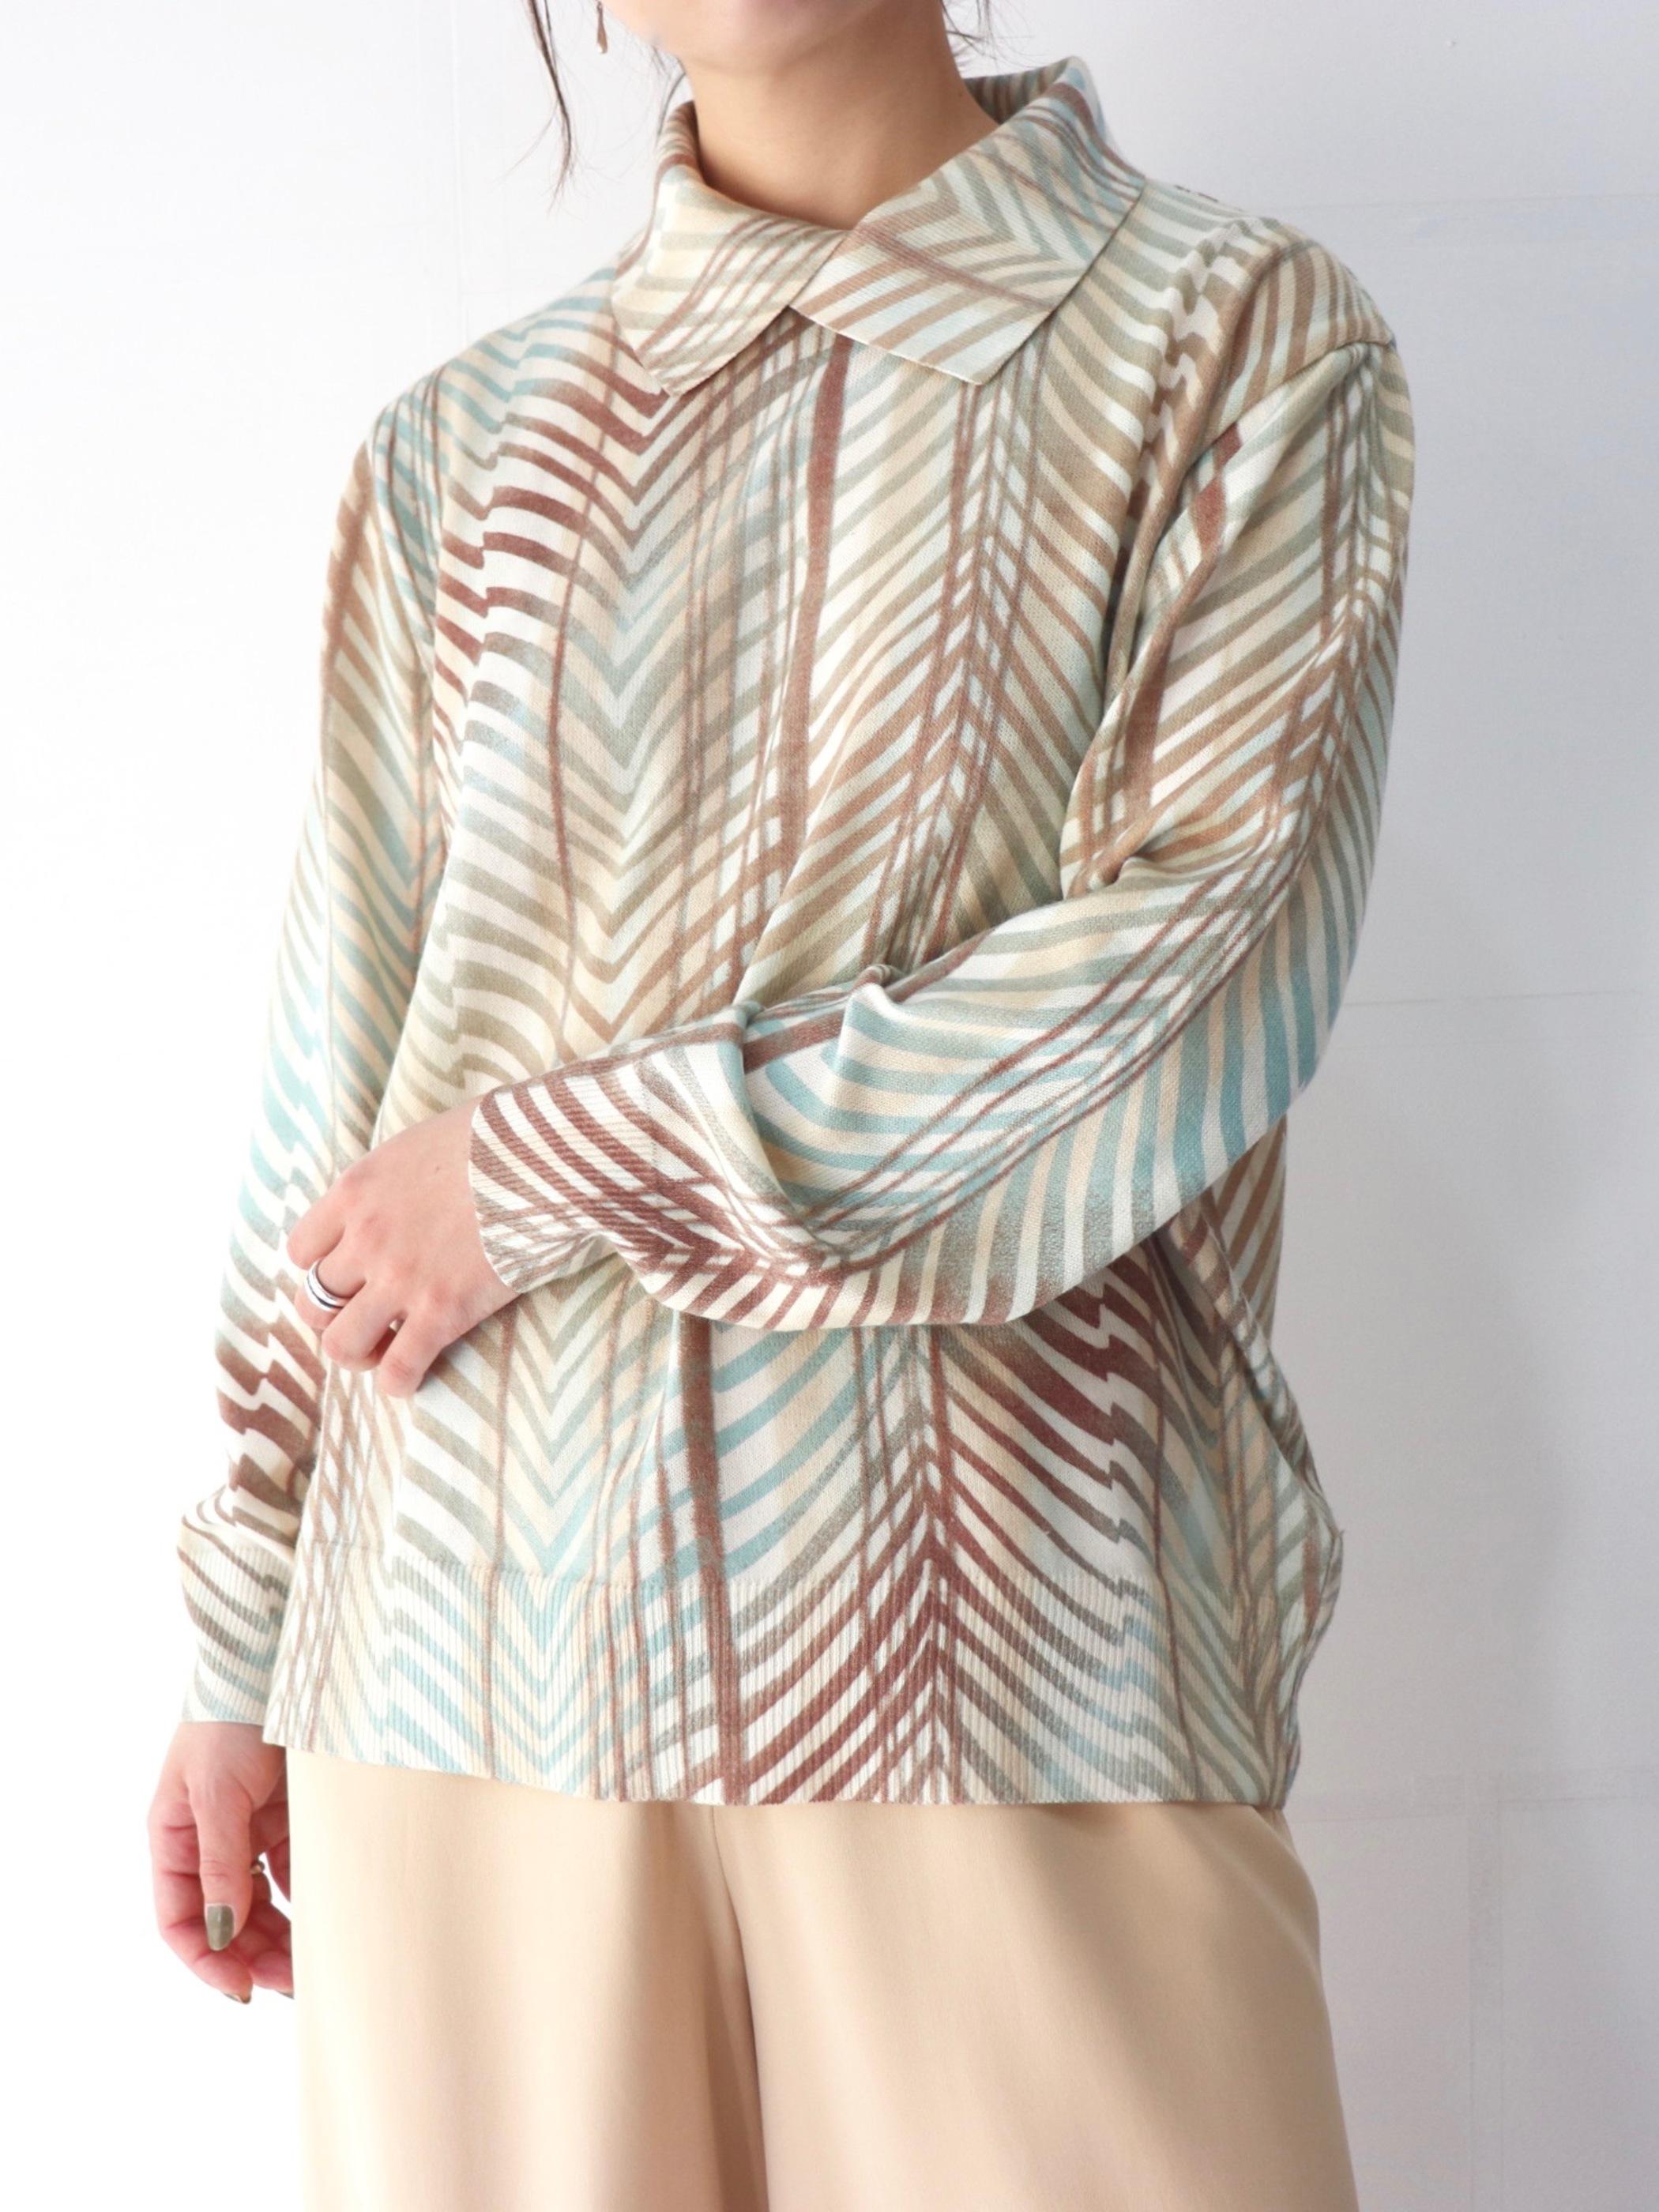 Euro summer knit tops